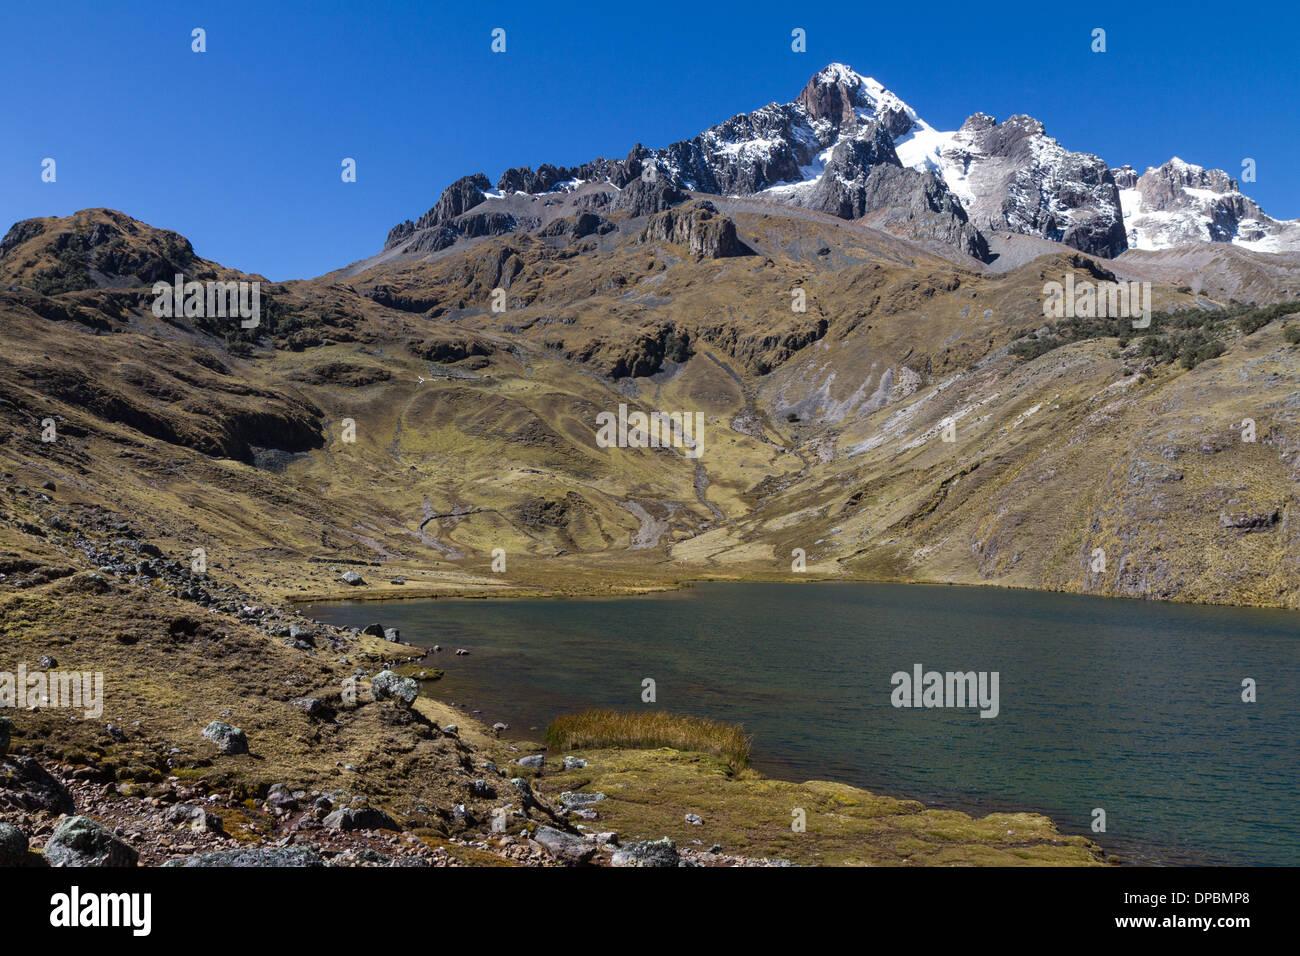 Nevado capacsaya, Peru - Stock Image